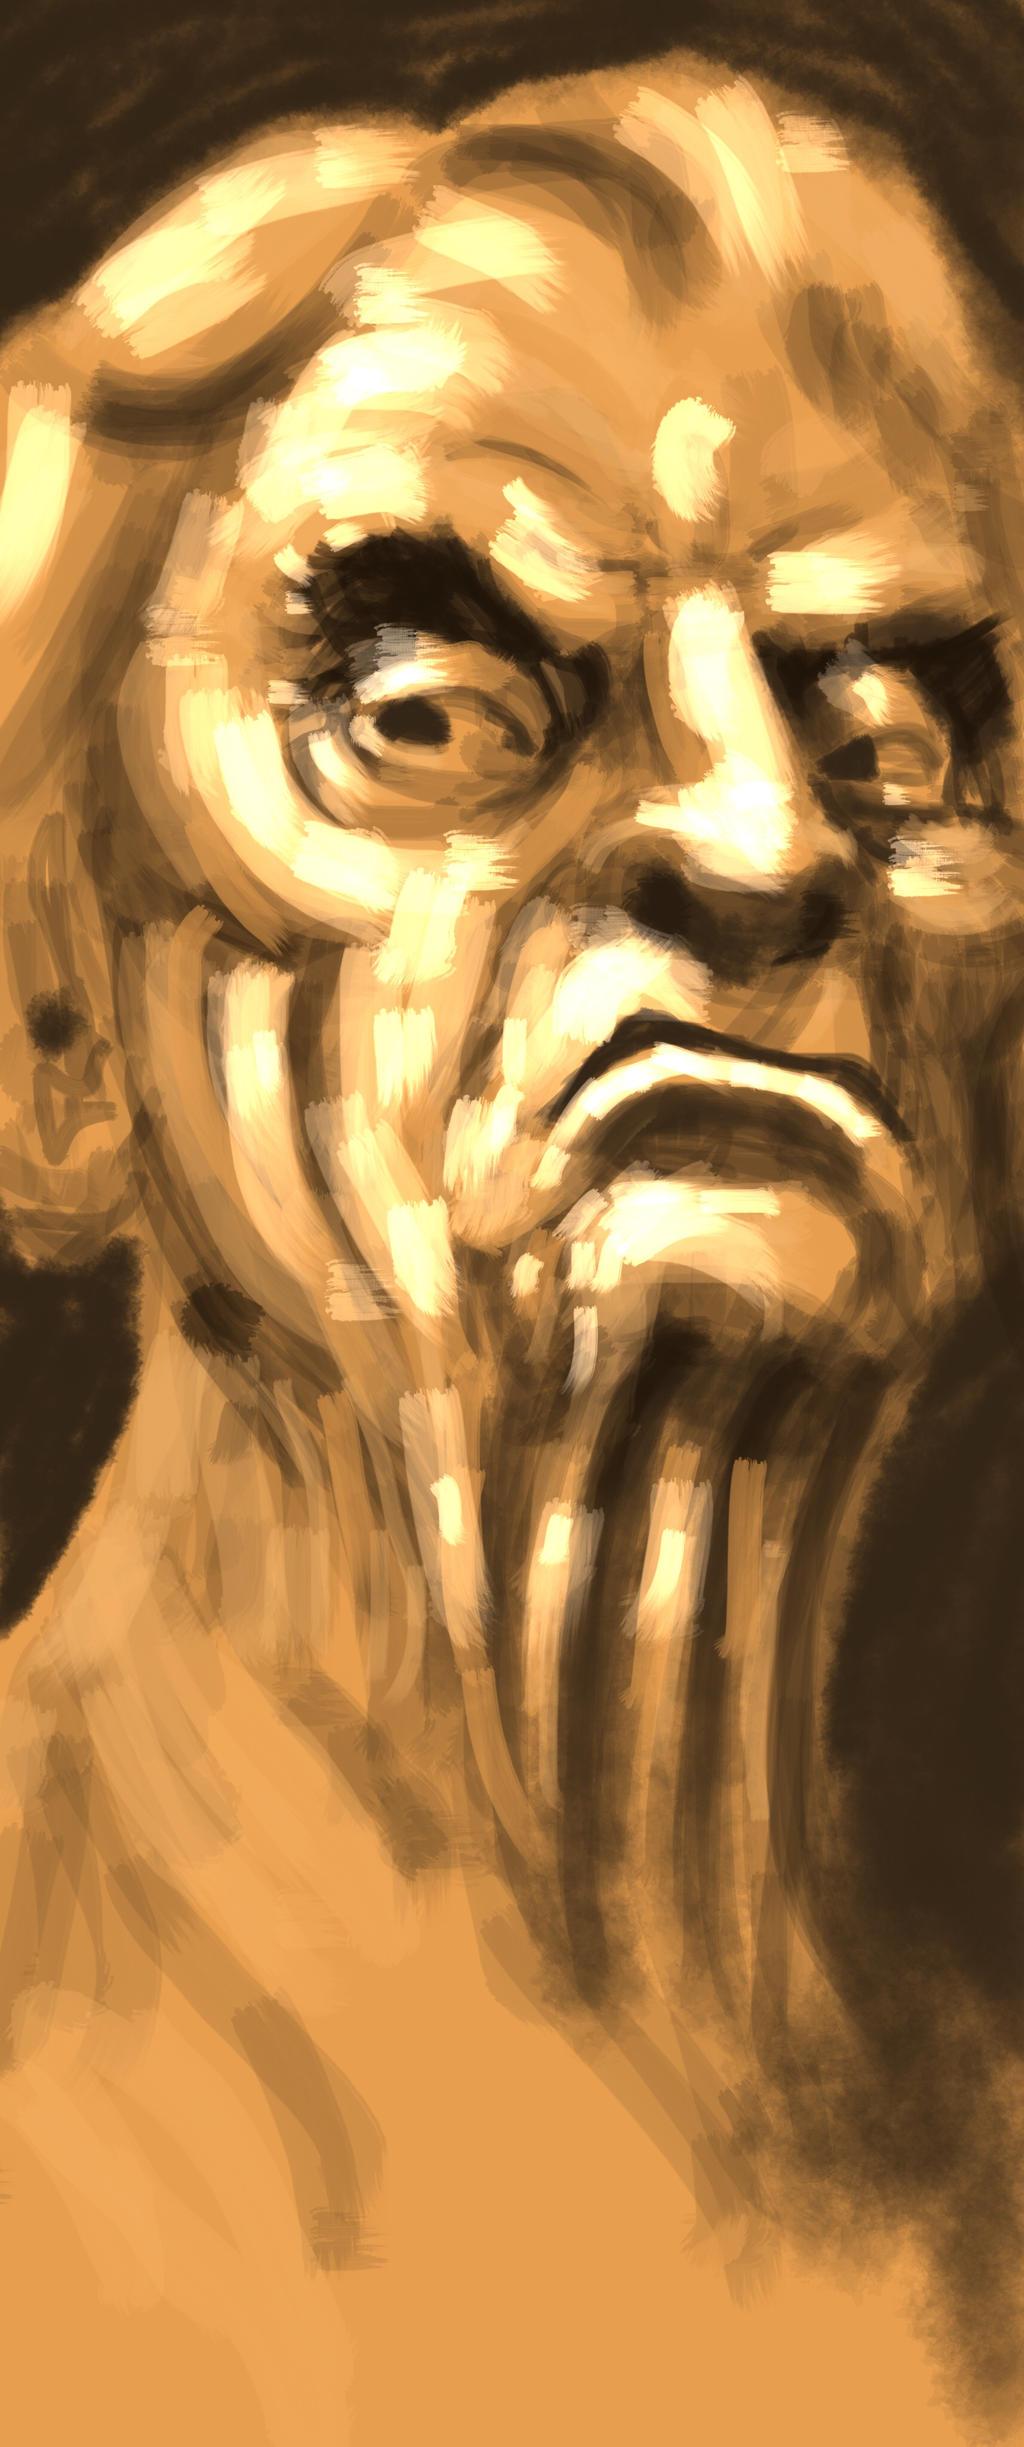 Old man by JeremyWDunn